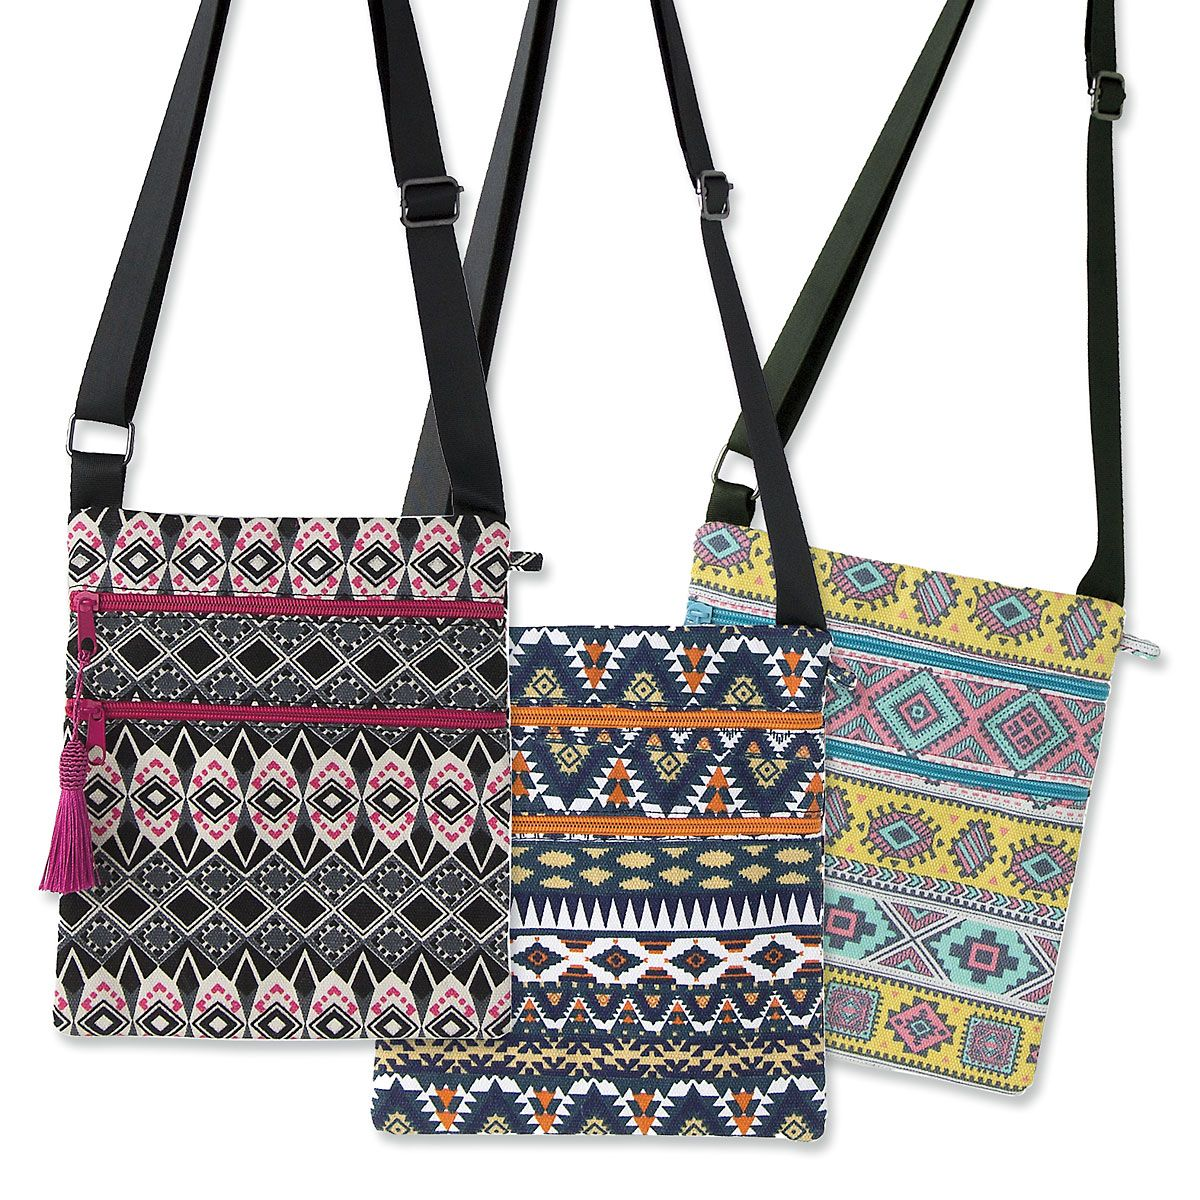 Wonderful Cross-Body Bag